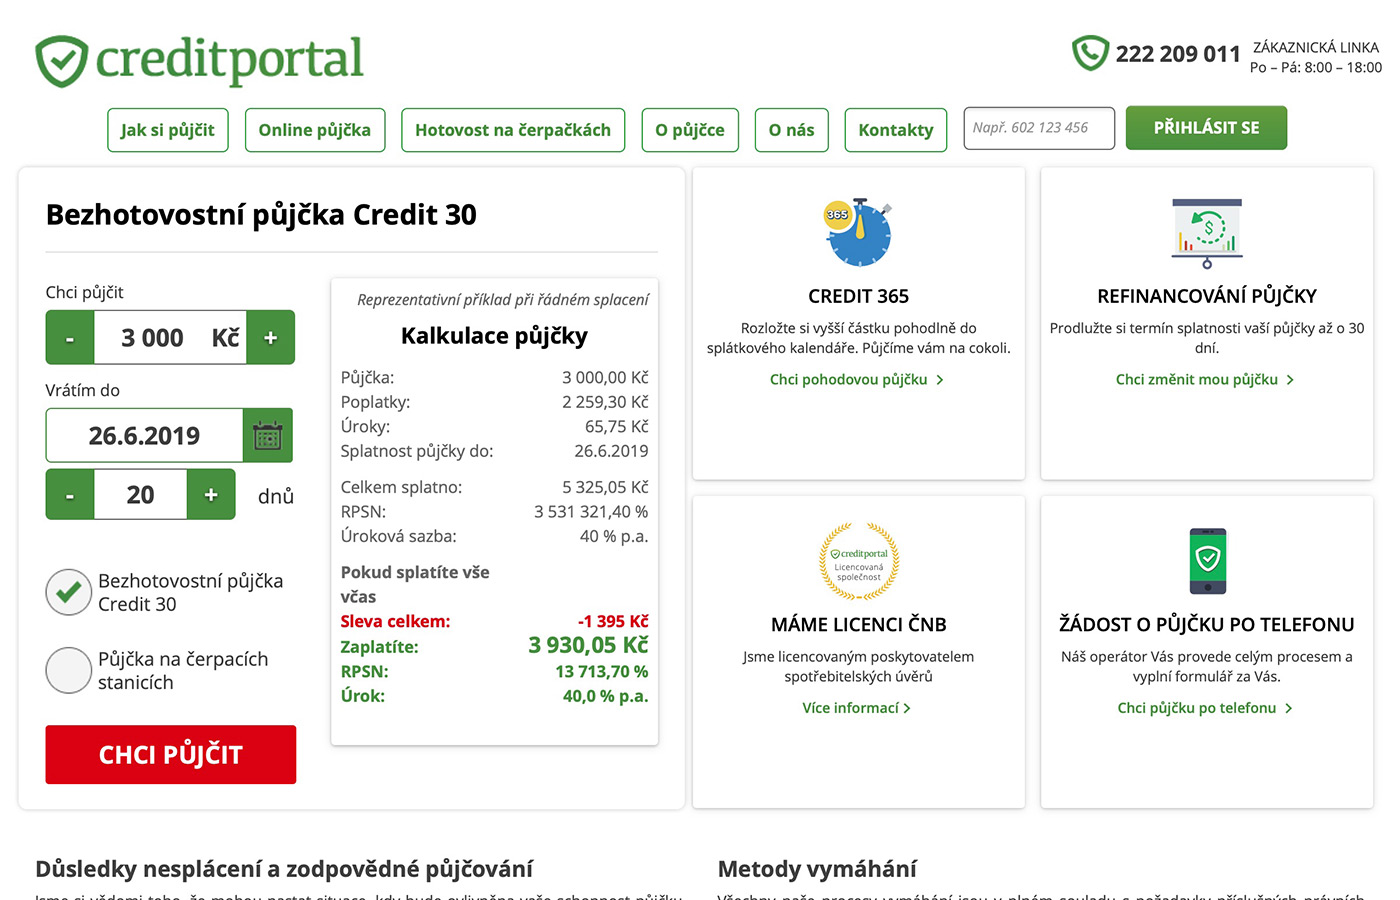 Webové stránky https://www.creditportal.cz/cs/kb/hotovostni-pujcka-na-cerpackach